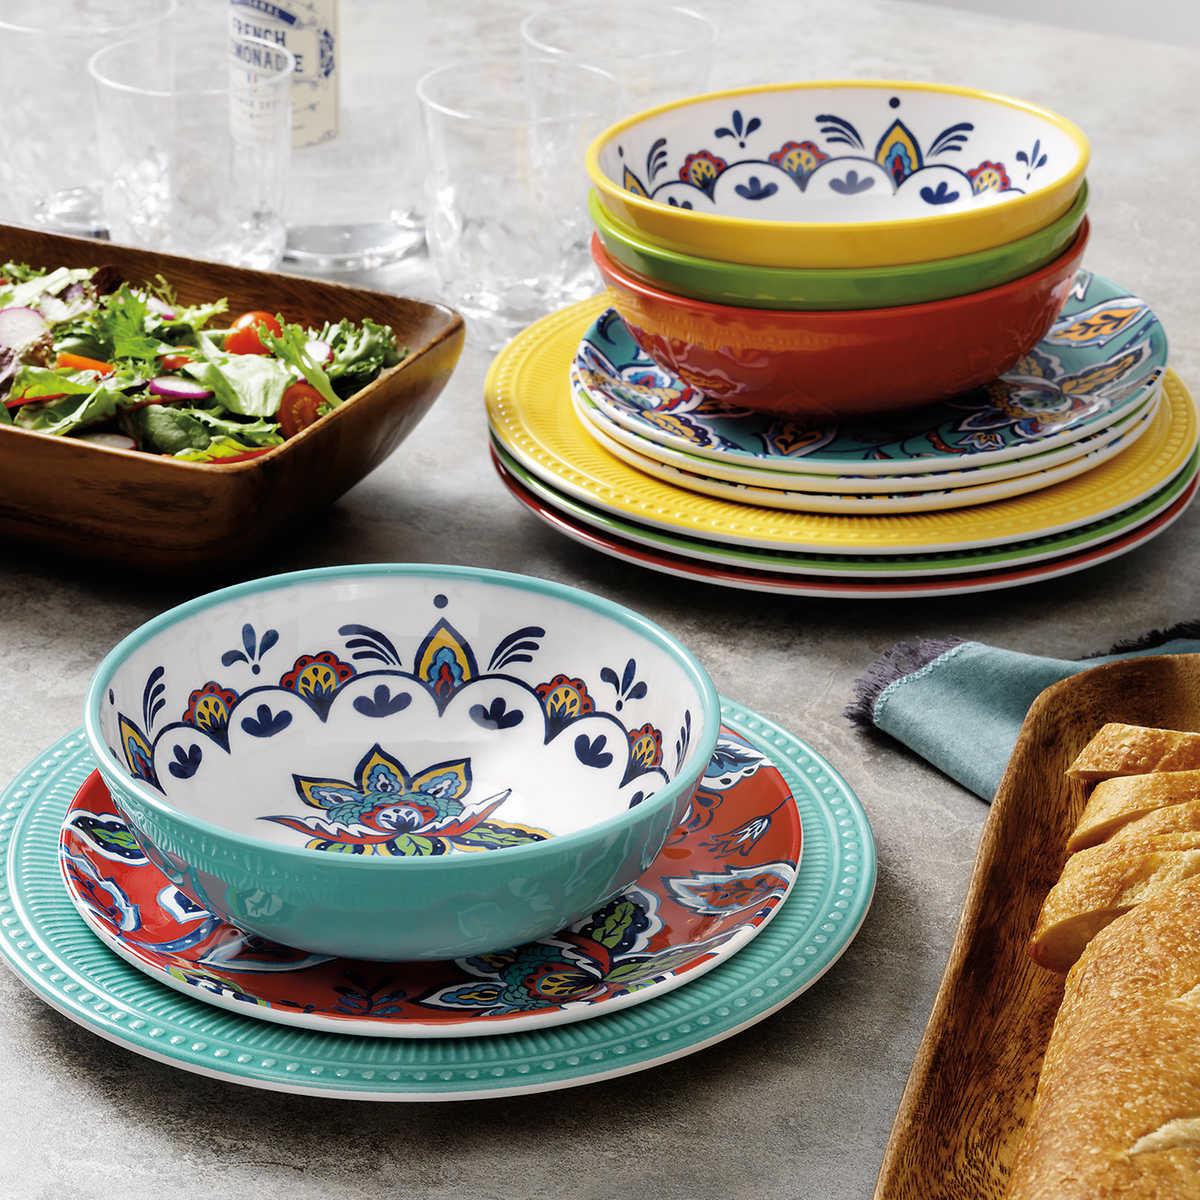 Pandex 12 Piece Melamine Dinnerware Set